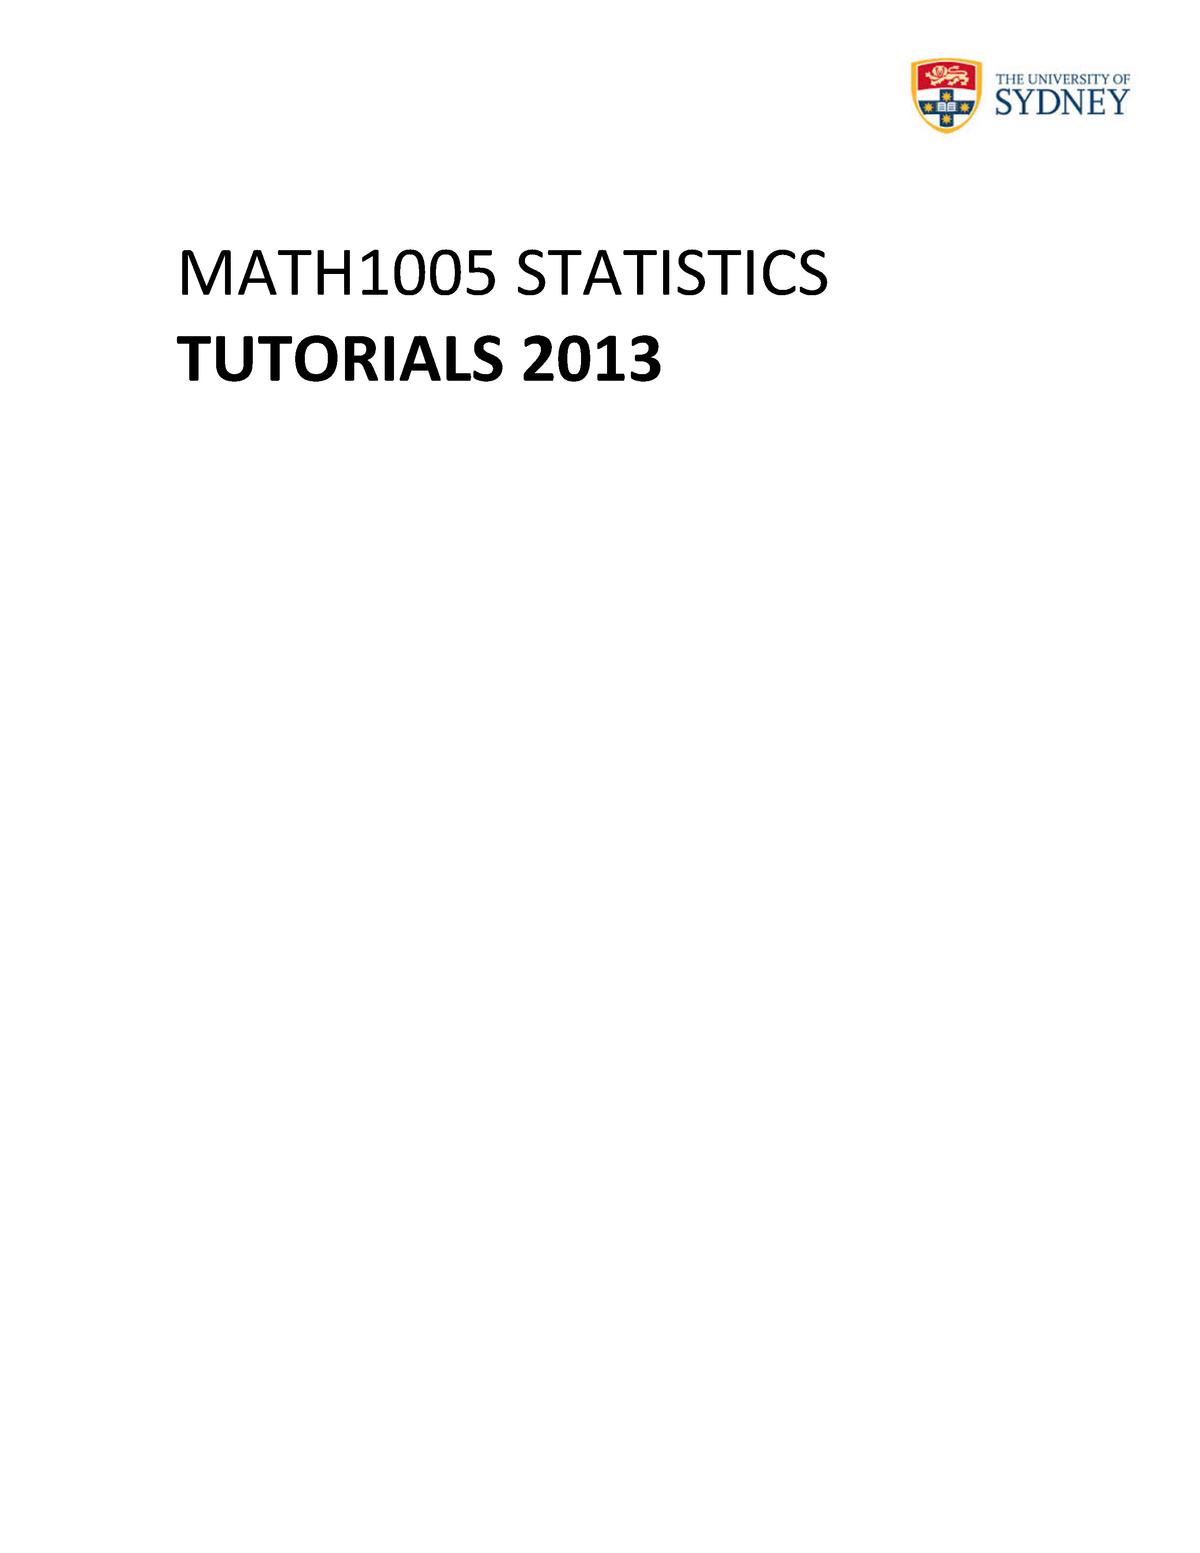 Tutorial work - tutorial worksheets - MATH1005: Statistics - StuDocu